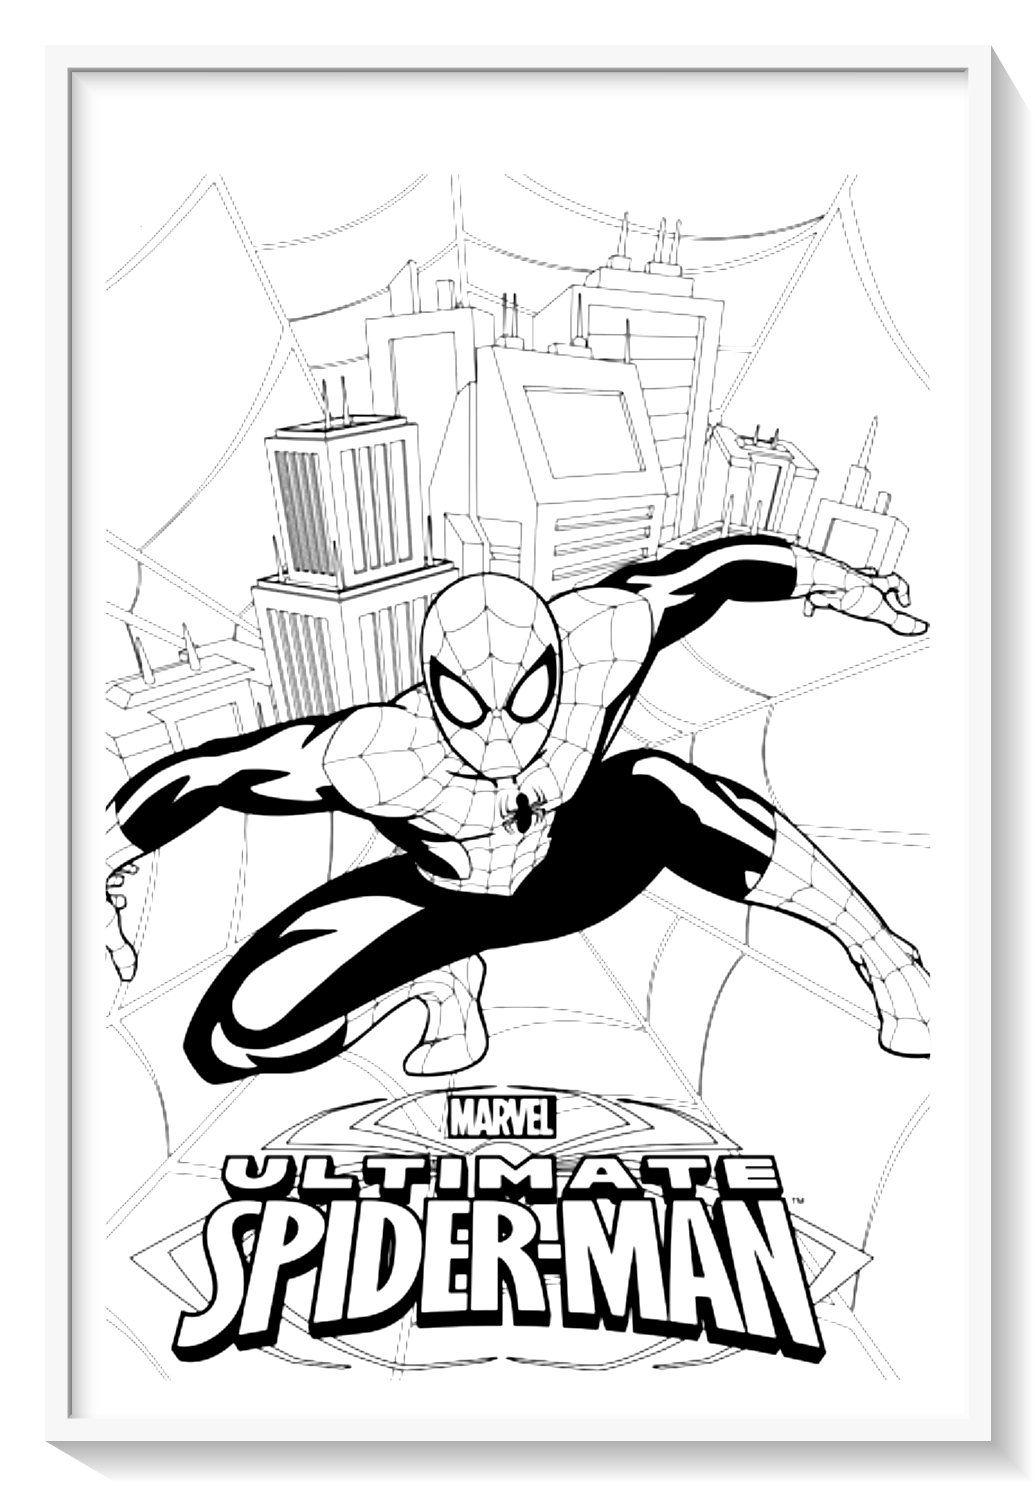 Épinglé sur Dibujos de SPIDERMAN (Hombre Araña) para Colorear